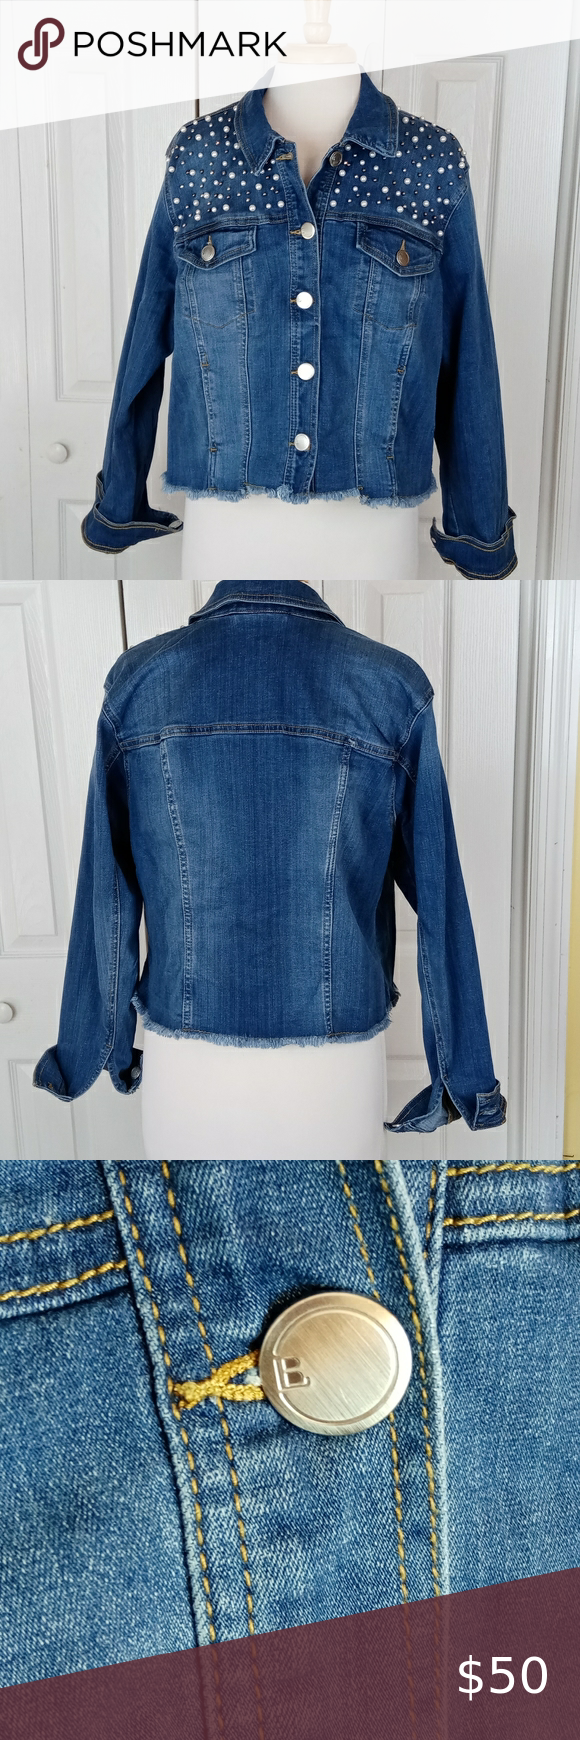 Lane Bryant Denim Jacket With Pearl Studs Denim Jacket Jackets Lane Bryant [ 1740 x 580 Pixel ]